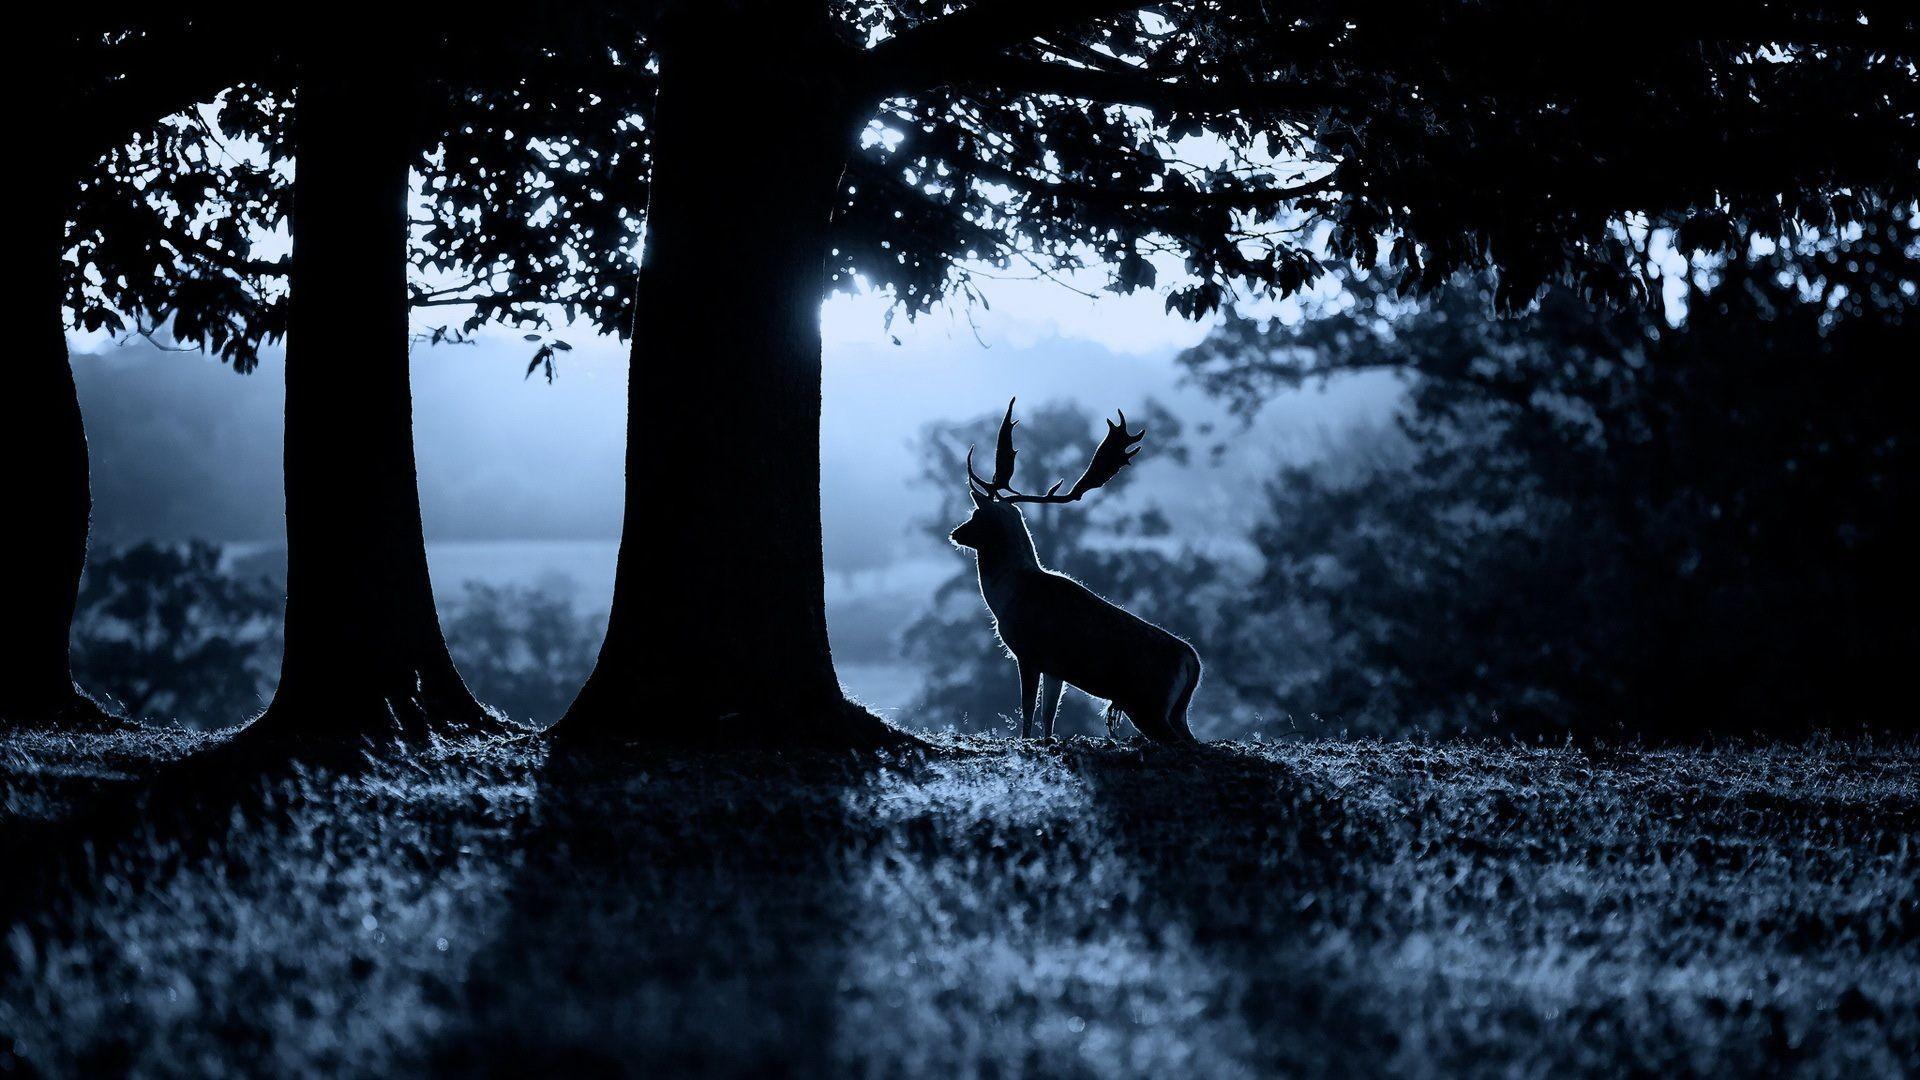 Download Free Deer Wallpaper Px High Resolution xPX Deer